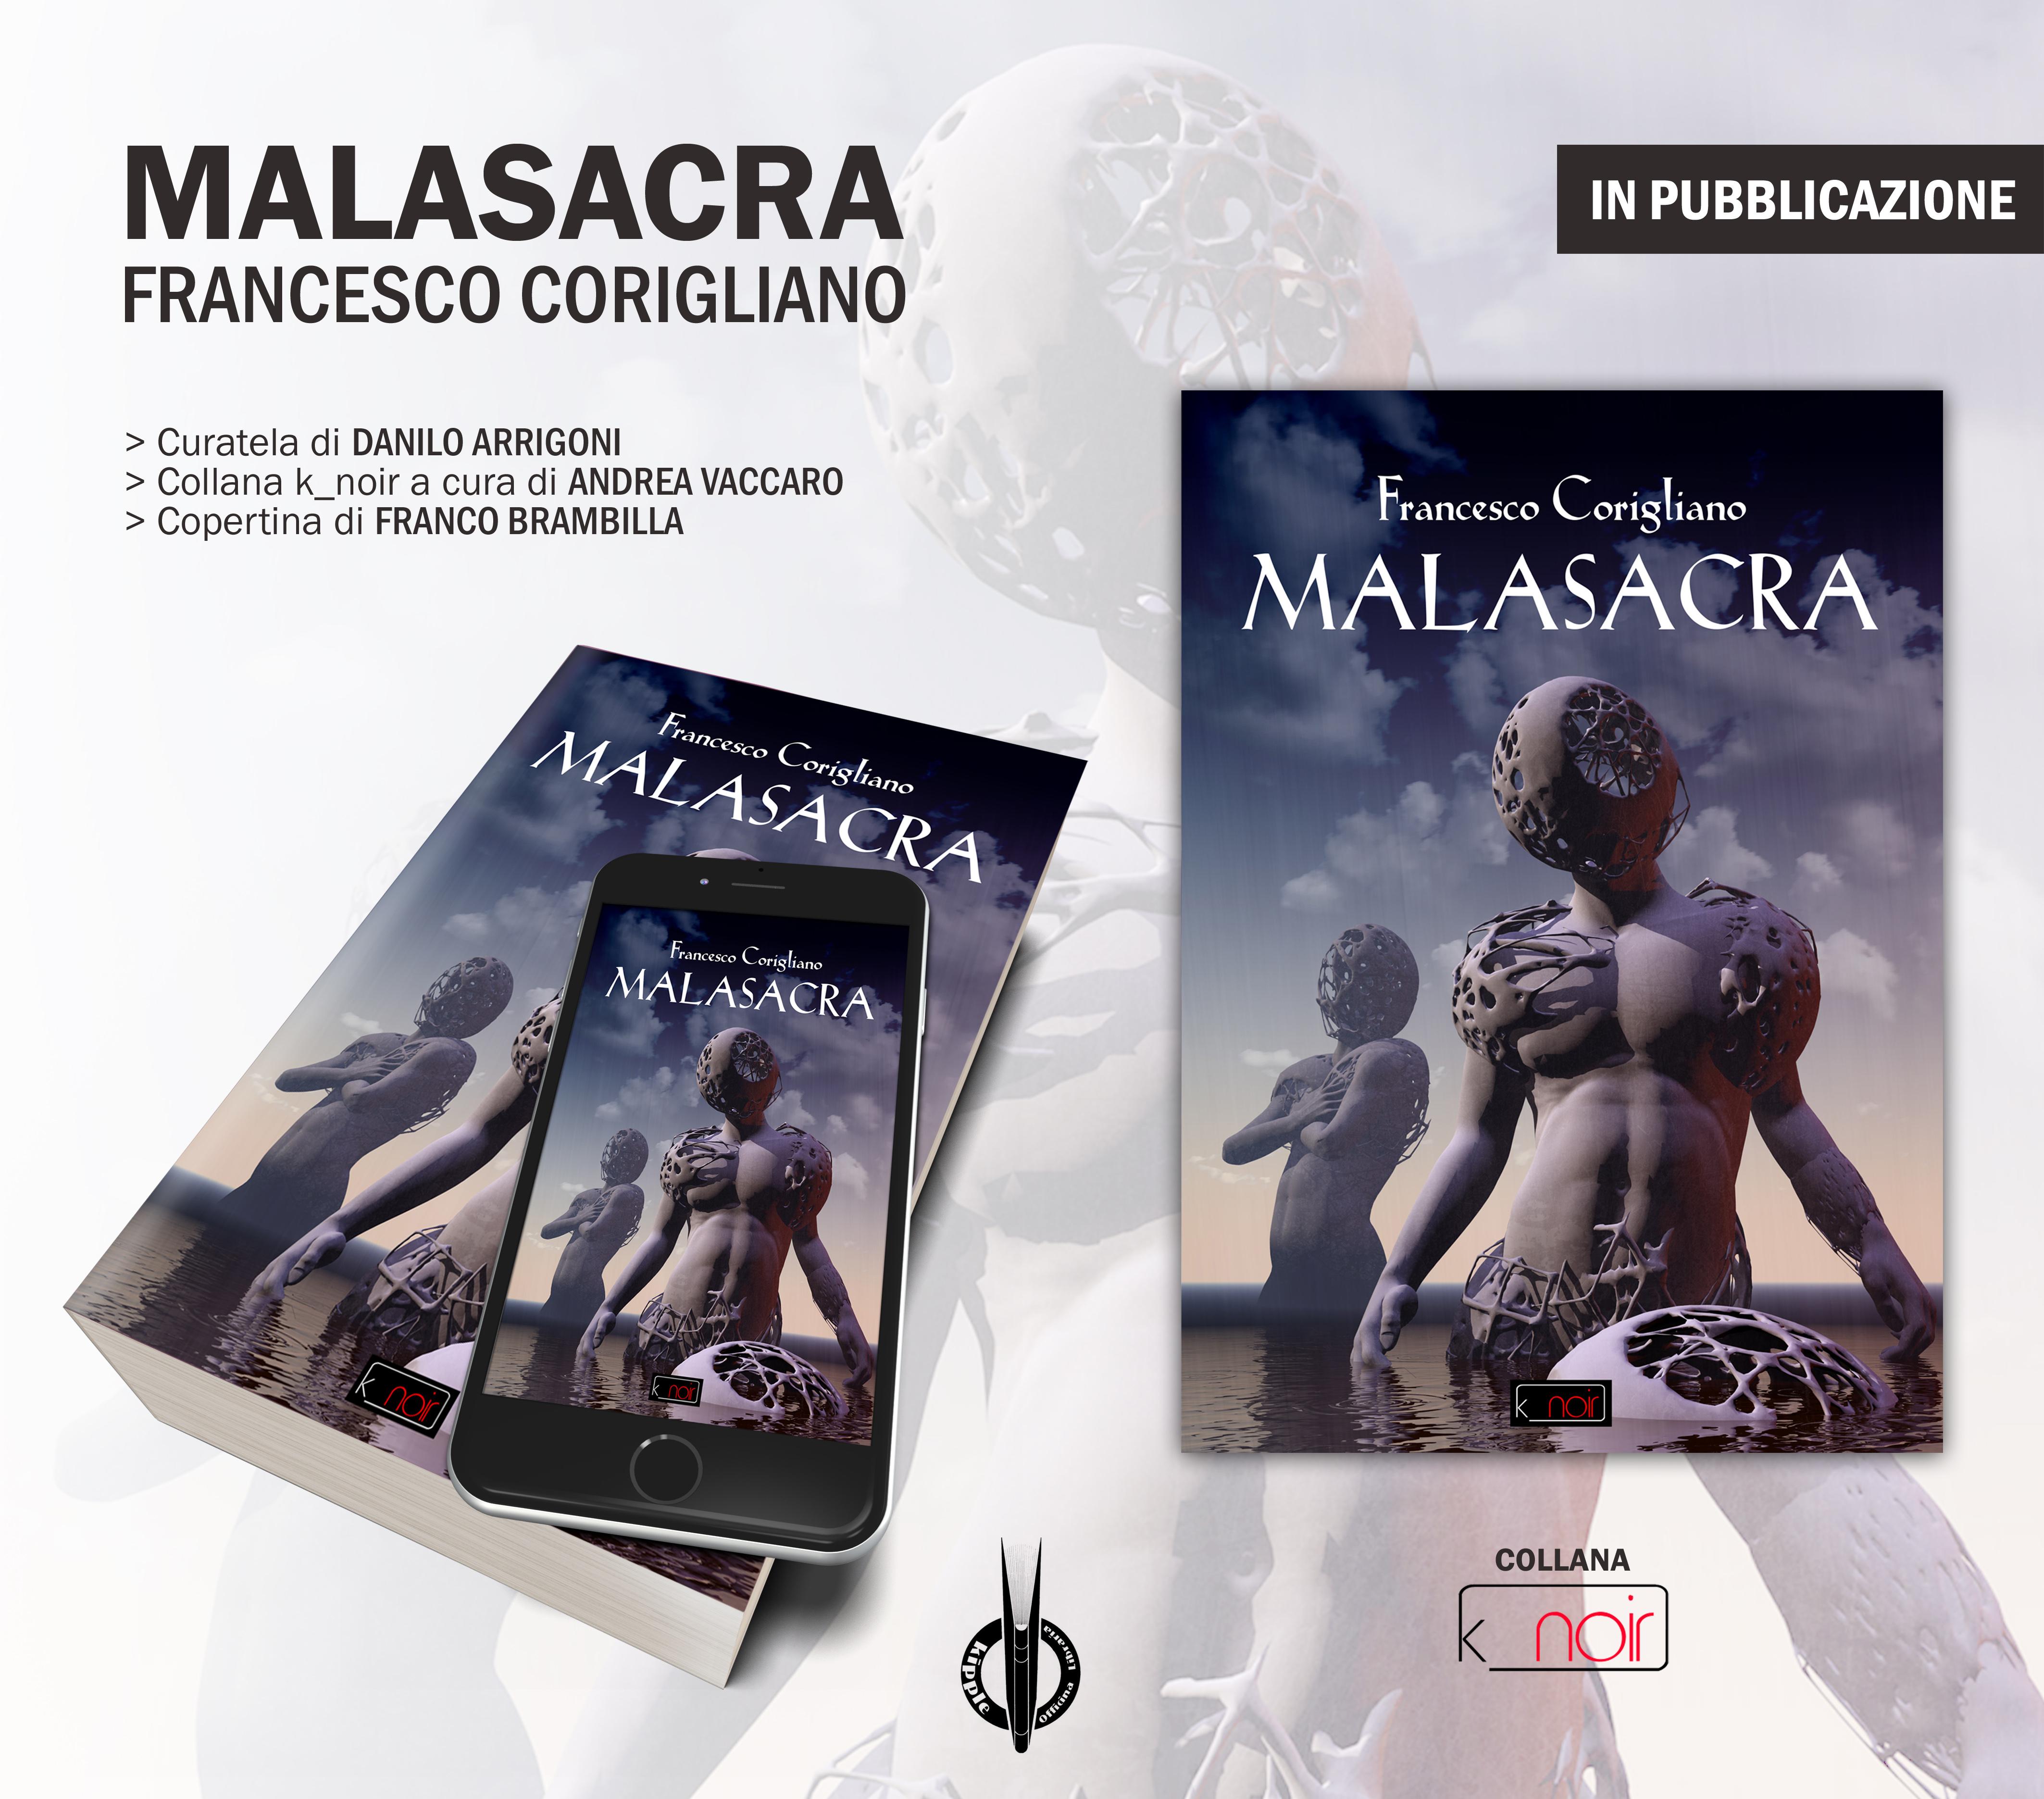 MALASACRA_mockup.jpg